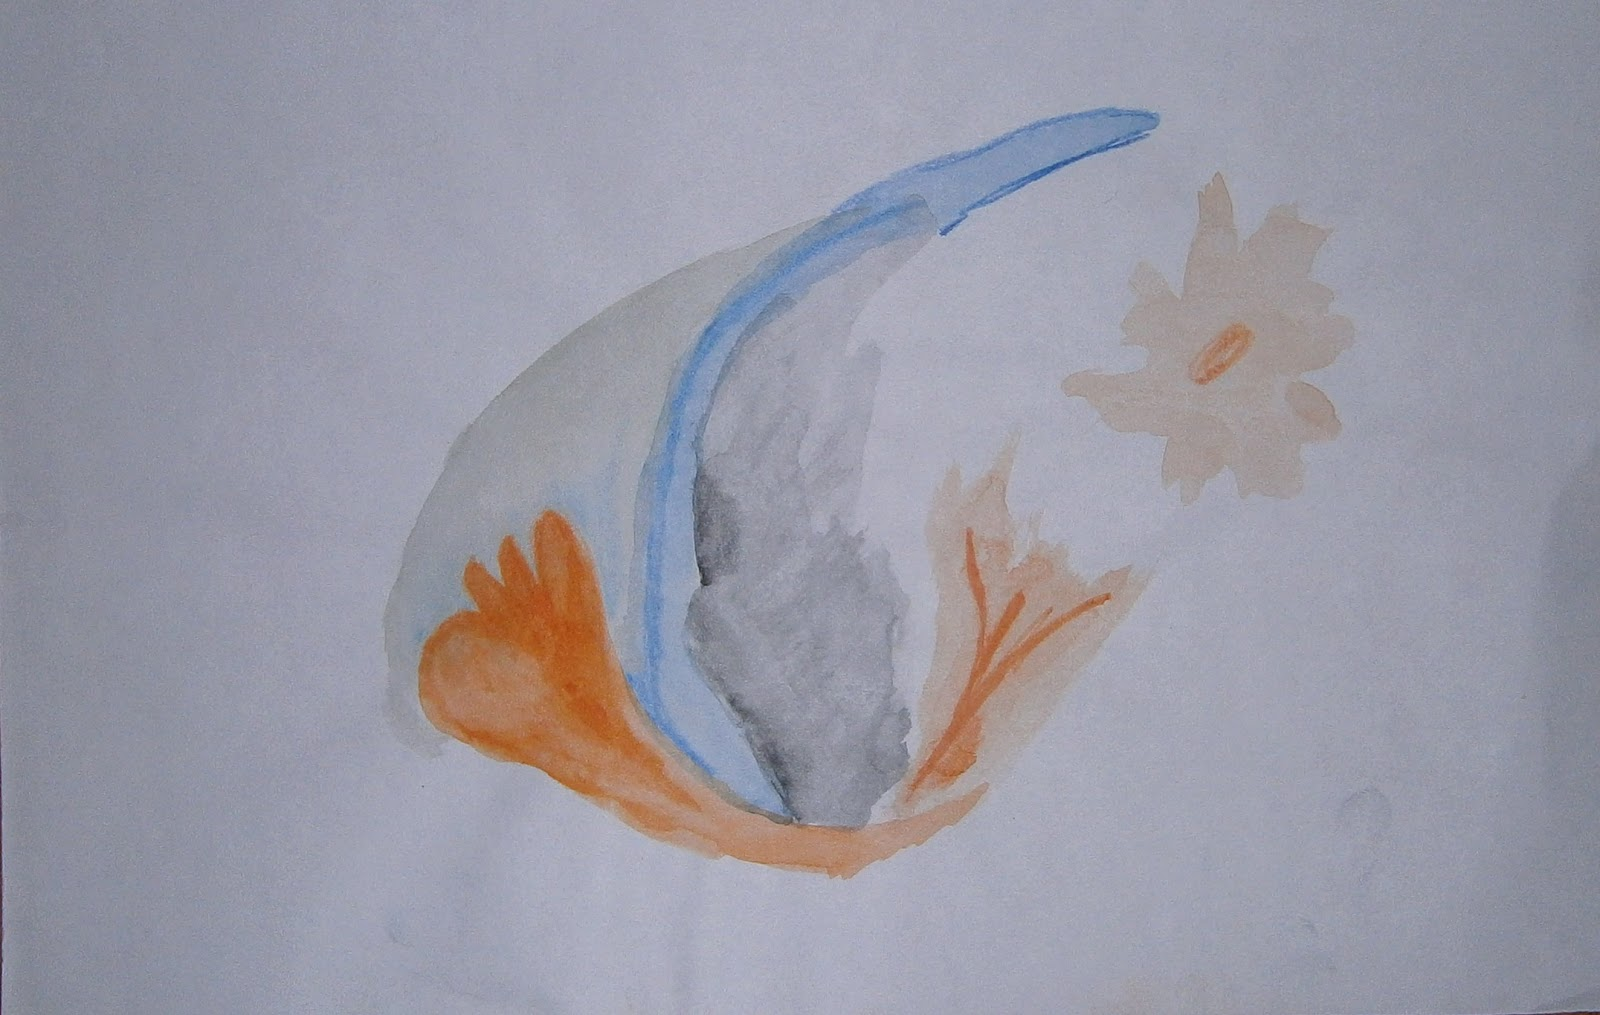 http://4.bp.blogspot.com/-ipVgHLD95ak/TnOMRWFCCsI/AAAAAAAAY-k/ZgYPEC0CfGc/s1600/Gallery+014.JPG